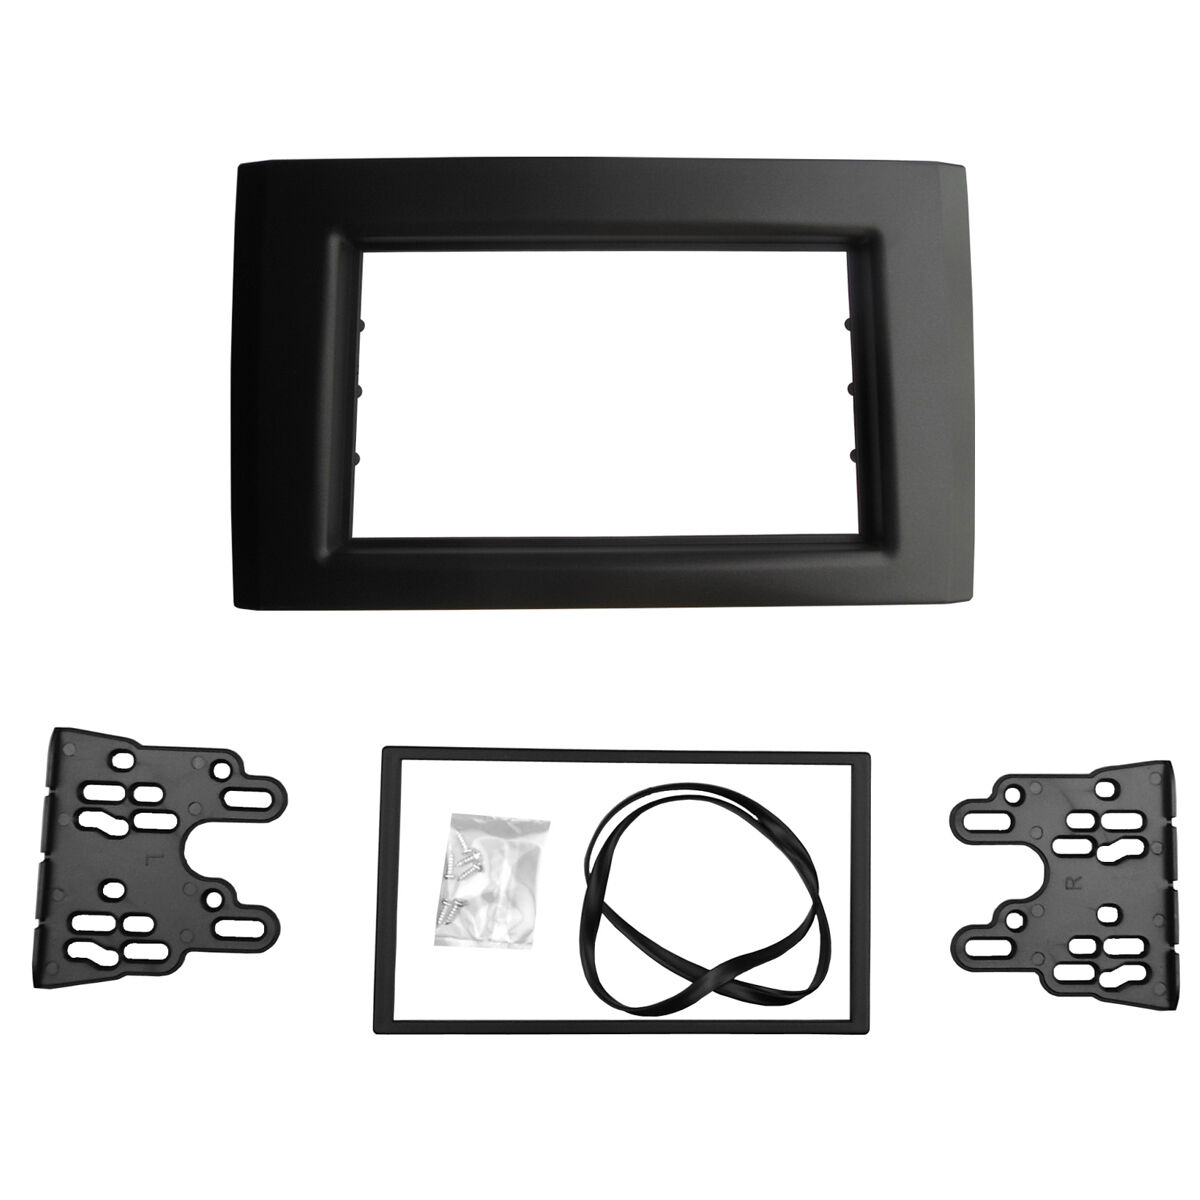 2 Din Radio Fascia For Volvo Xc90 Stereo Panel Dvd Mount Trim Kit Cd Frame Plate